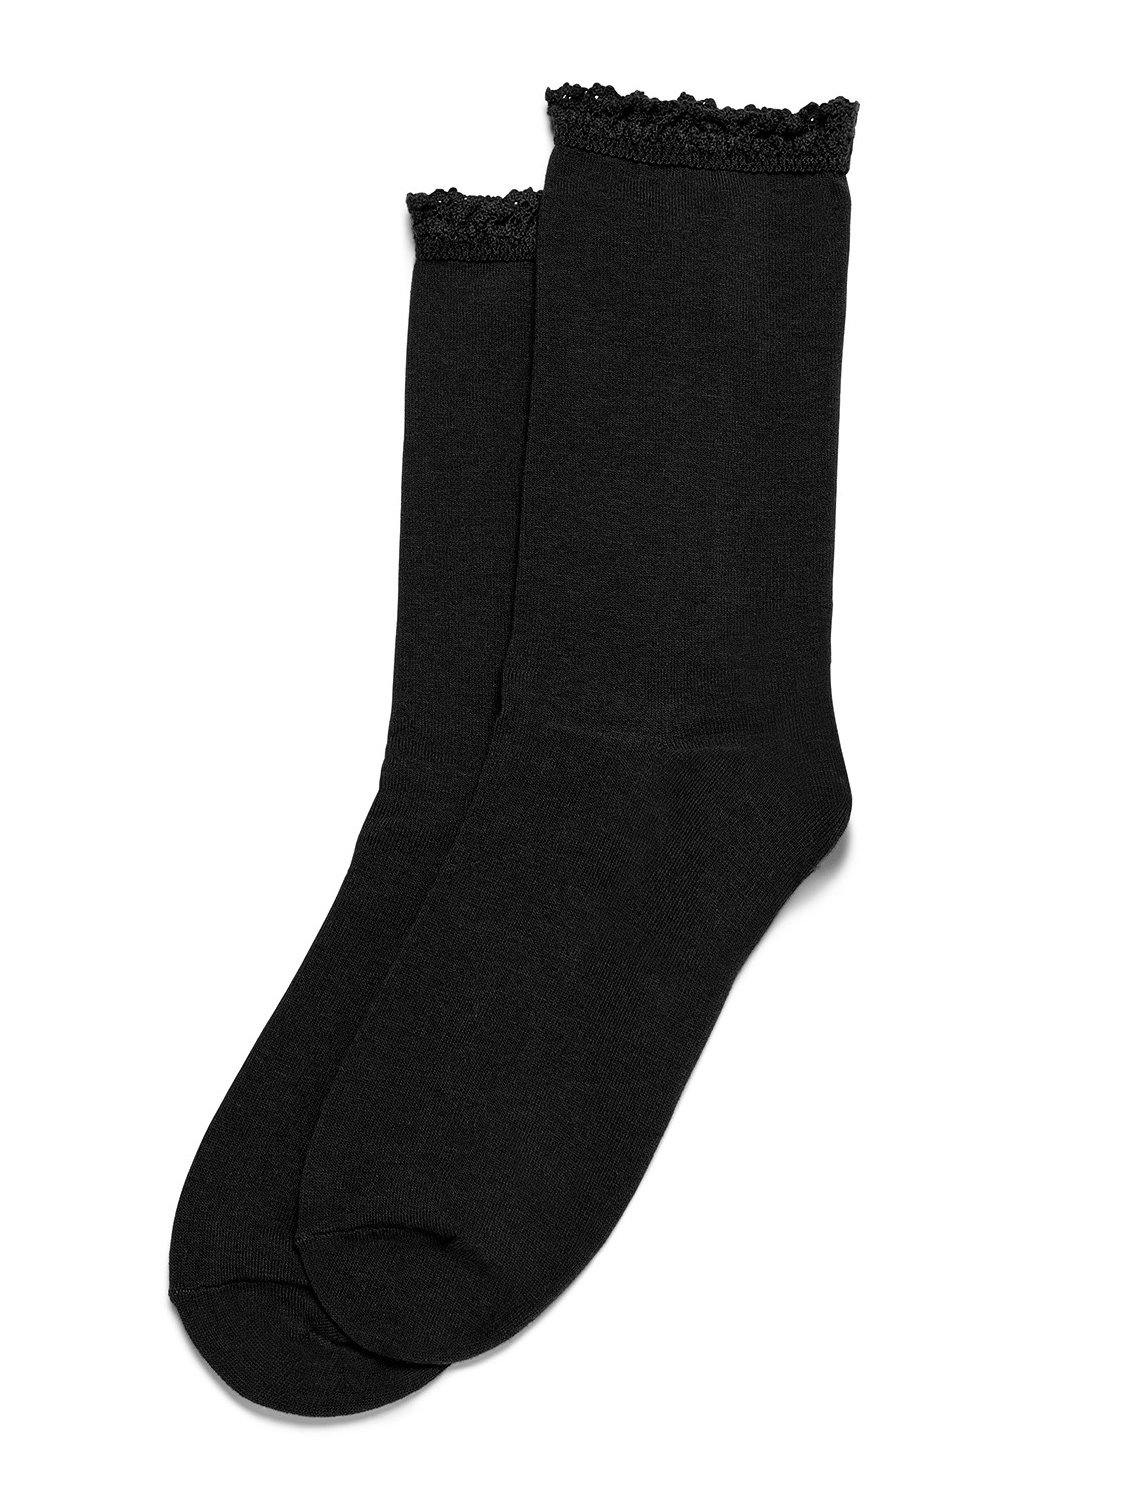 Hue Women's Lace Trim Socks, Black, Medium